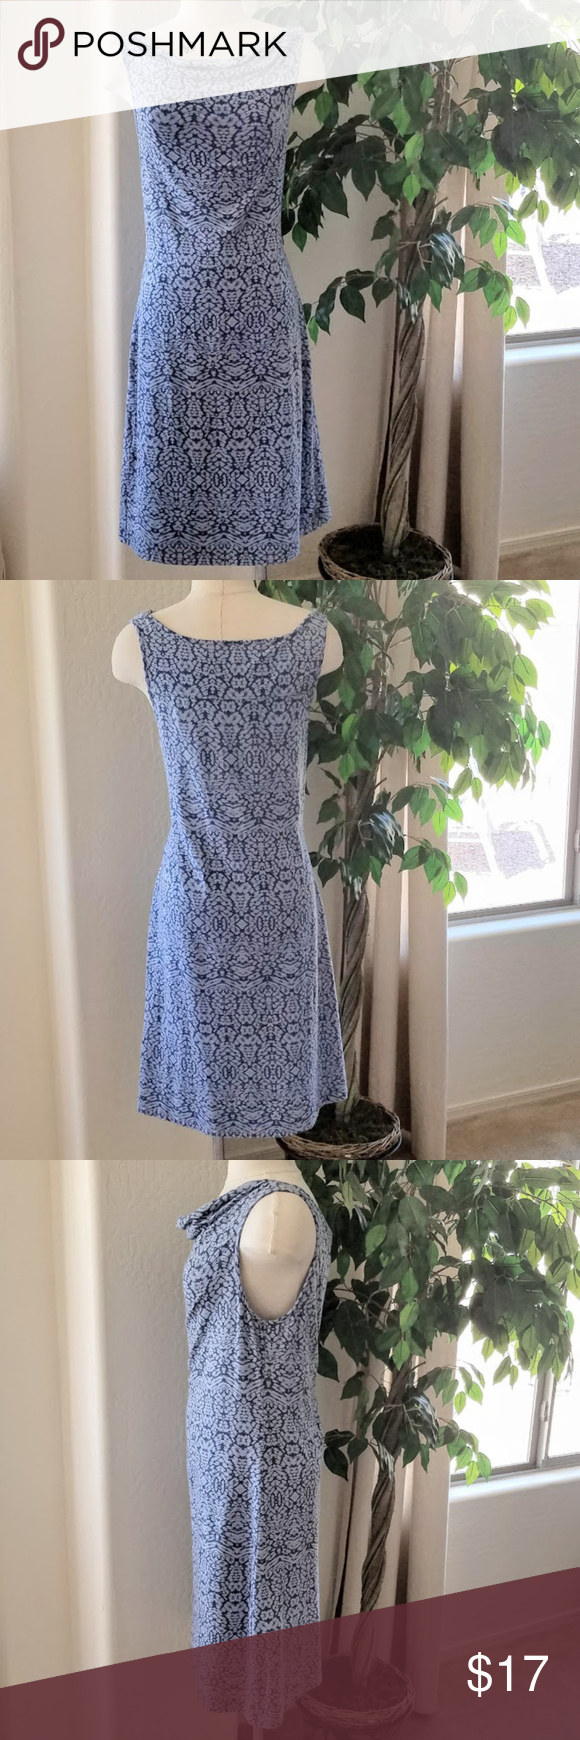 Edddie Bauer Super Comfy Stretchy Summer Dress Summer Dresses Form Fitting Dress Clothes Design [ 1740 x 580 Pixel ]